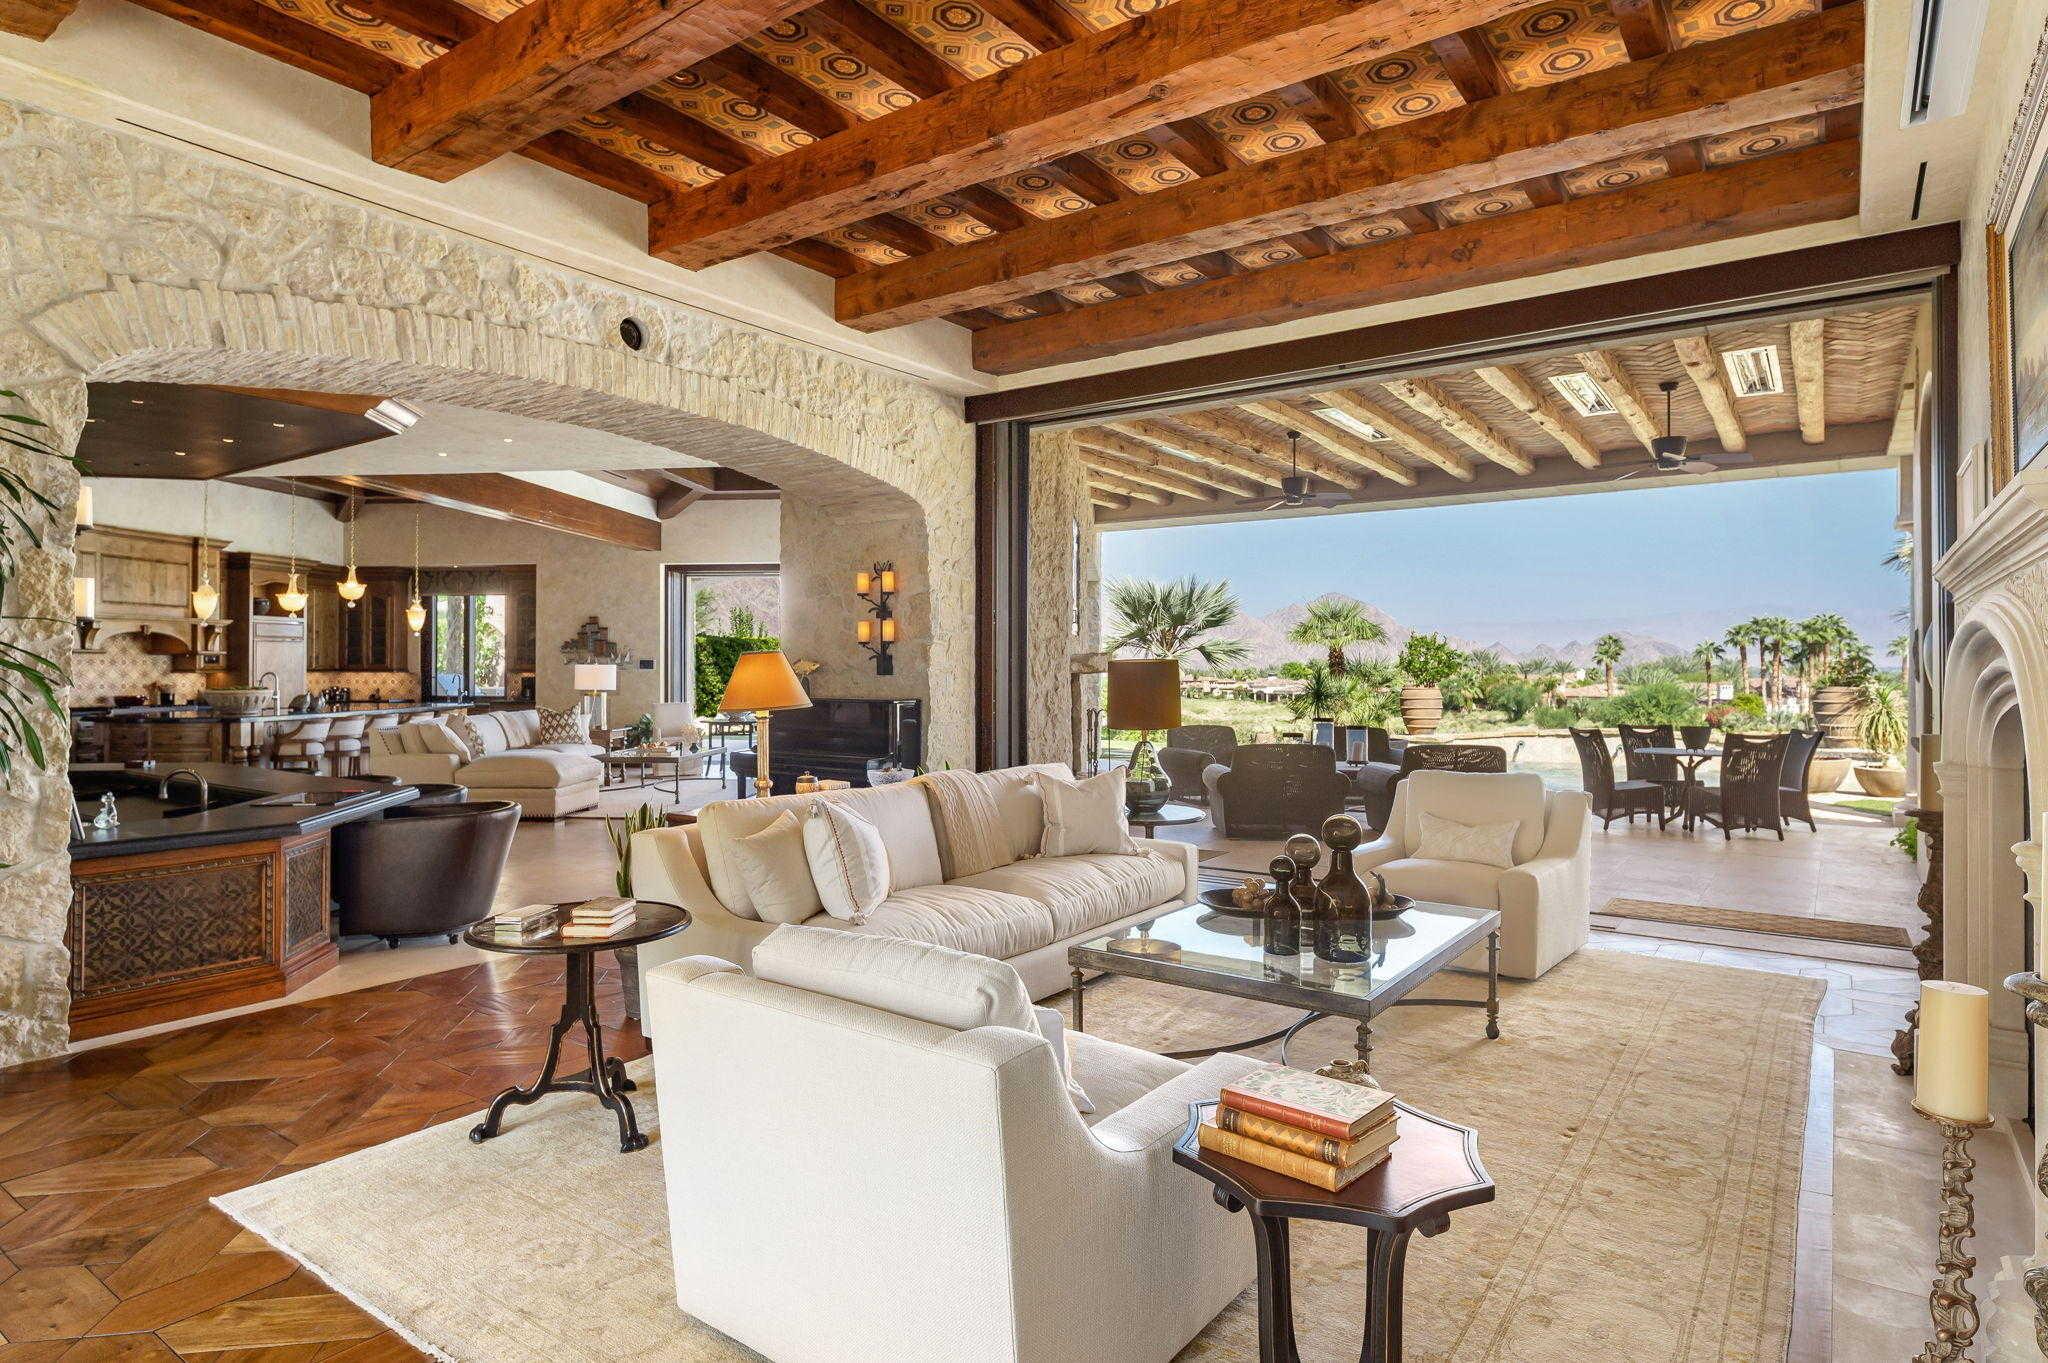 $5,999,500 - 4Br/7Ba -  for Sale in Tradition Golf Club, La Quinta